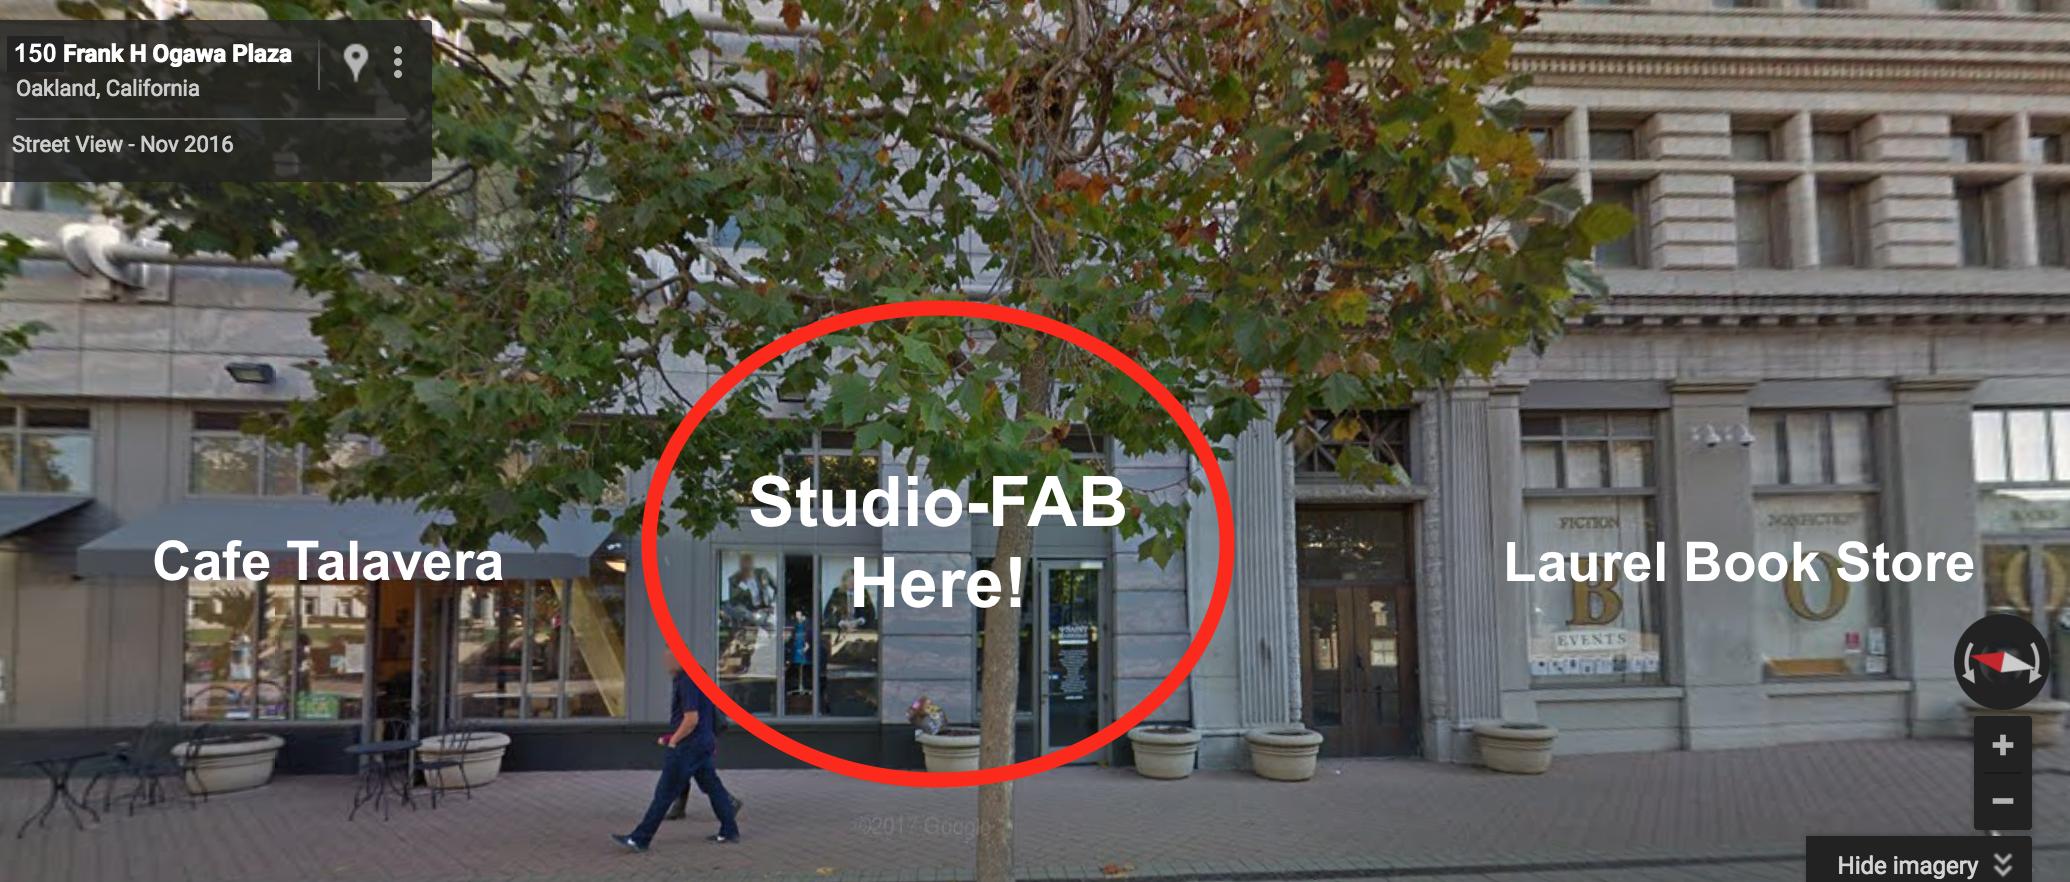 Studio-FAB_OaklandFankOgawa_Location